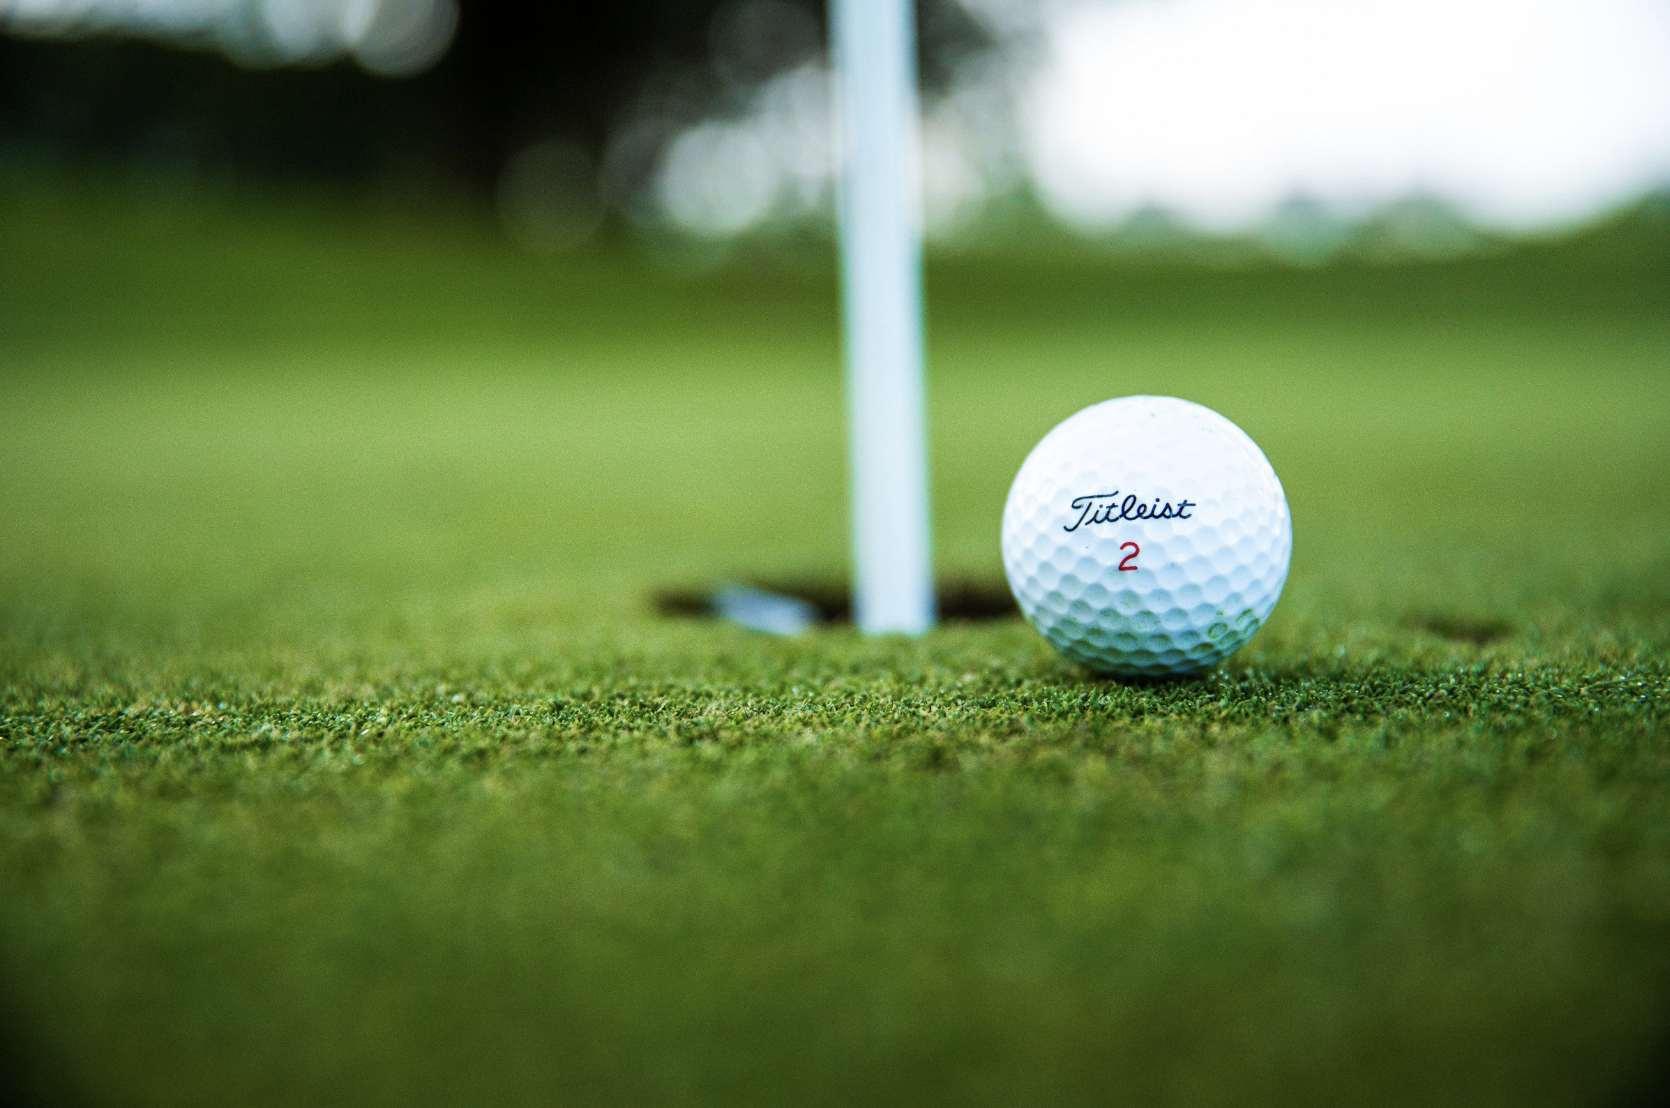 A black golf club resting against a golf ball on grass.